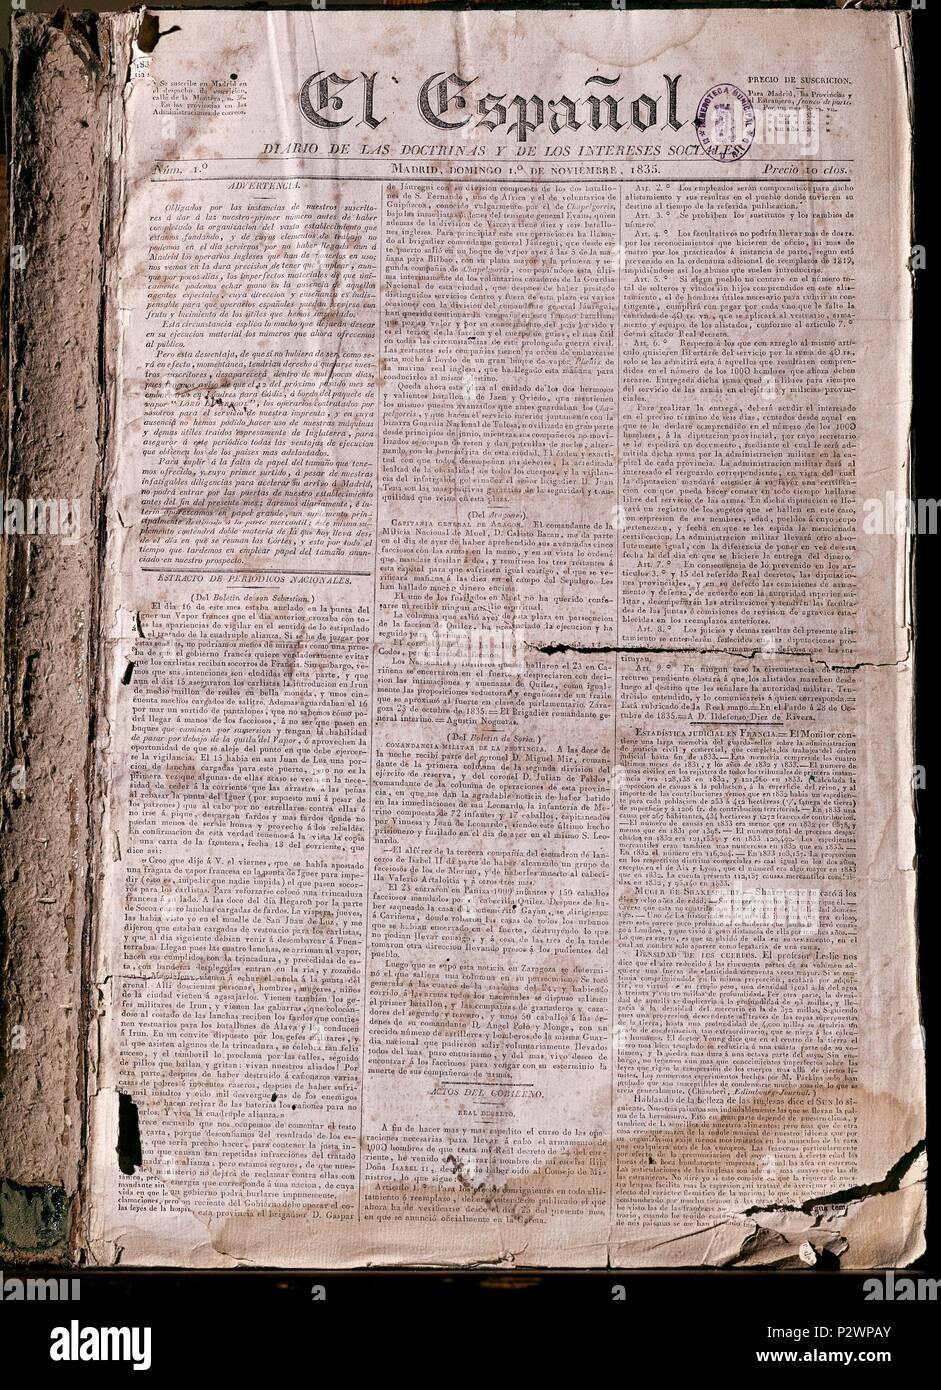 PERIODICO EL ESPANOL 1835. Location: HEMEROTECA MUNICIPAL, SPAIN. - Stock Image